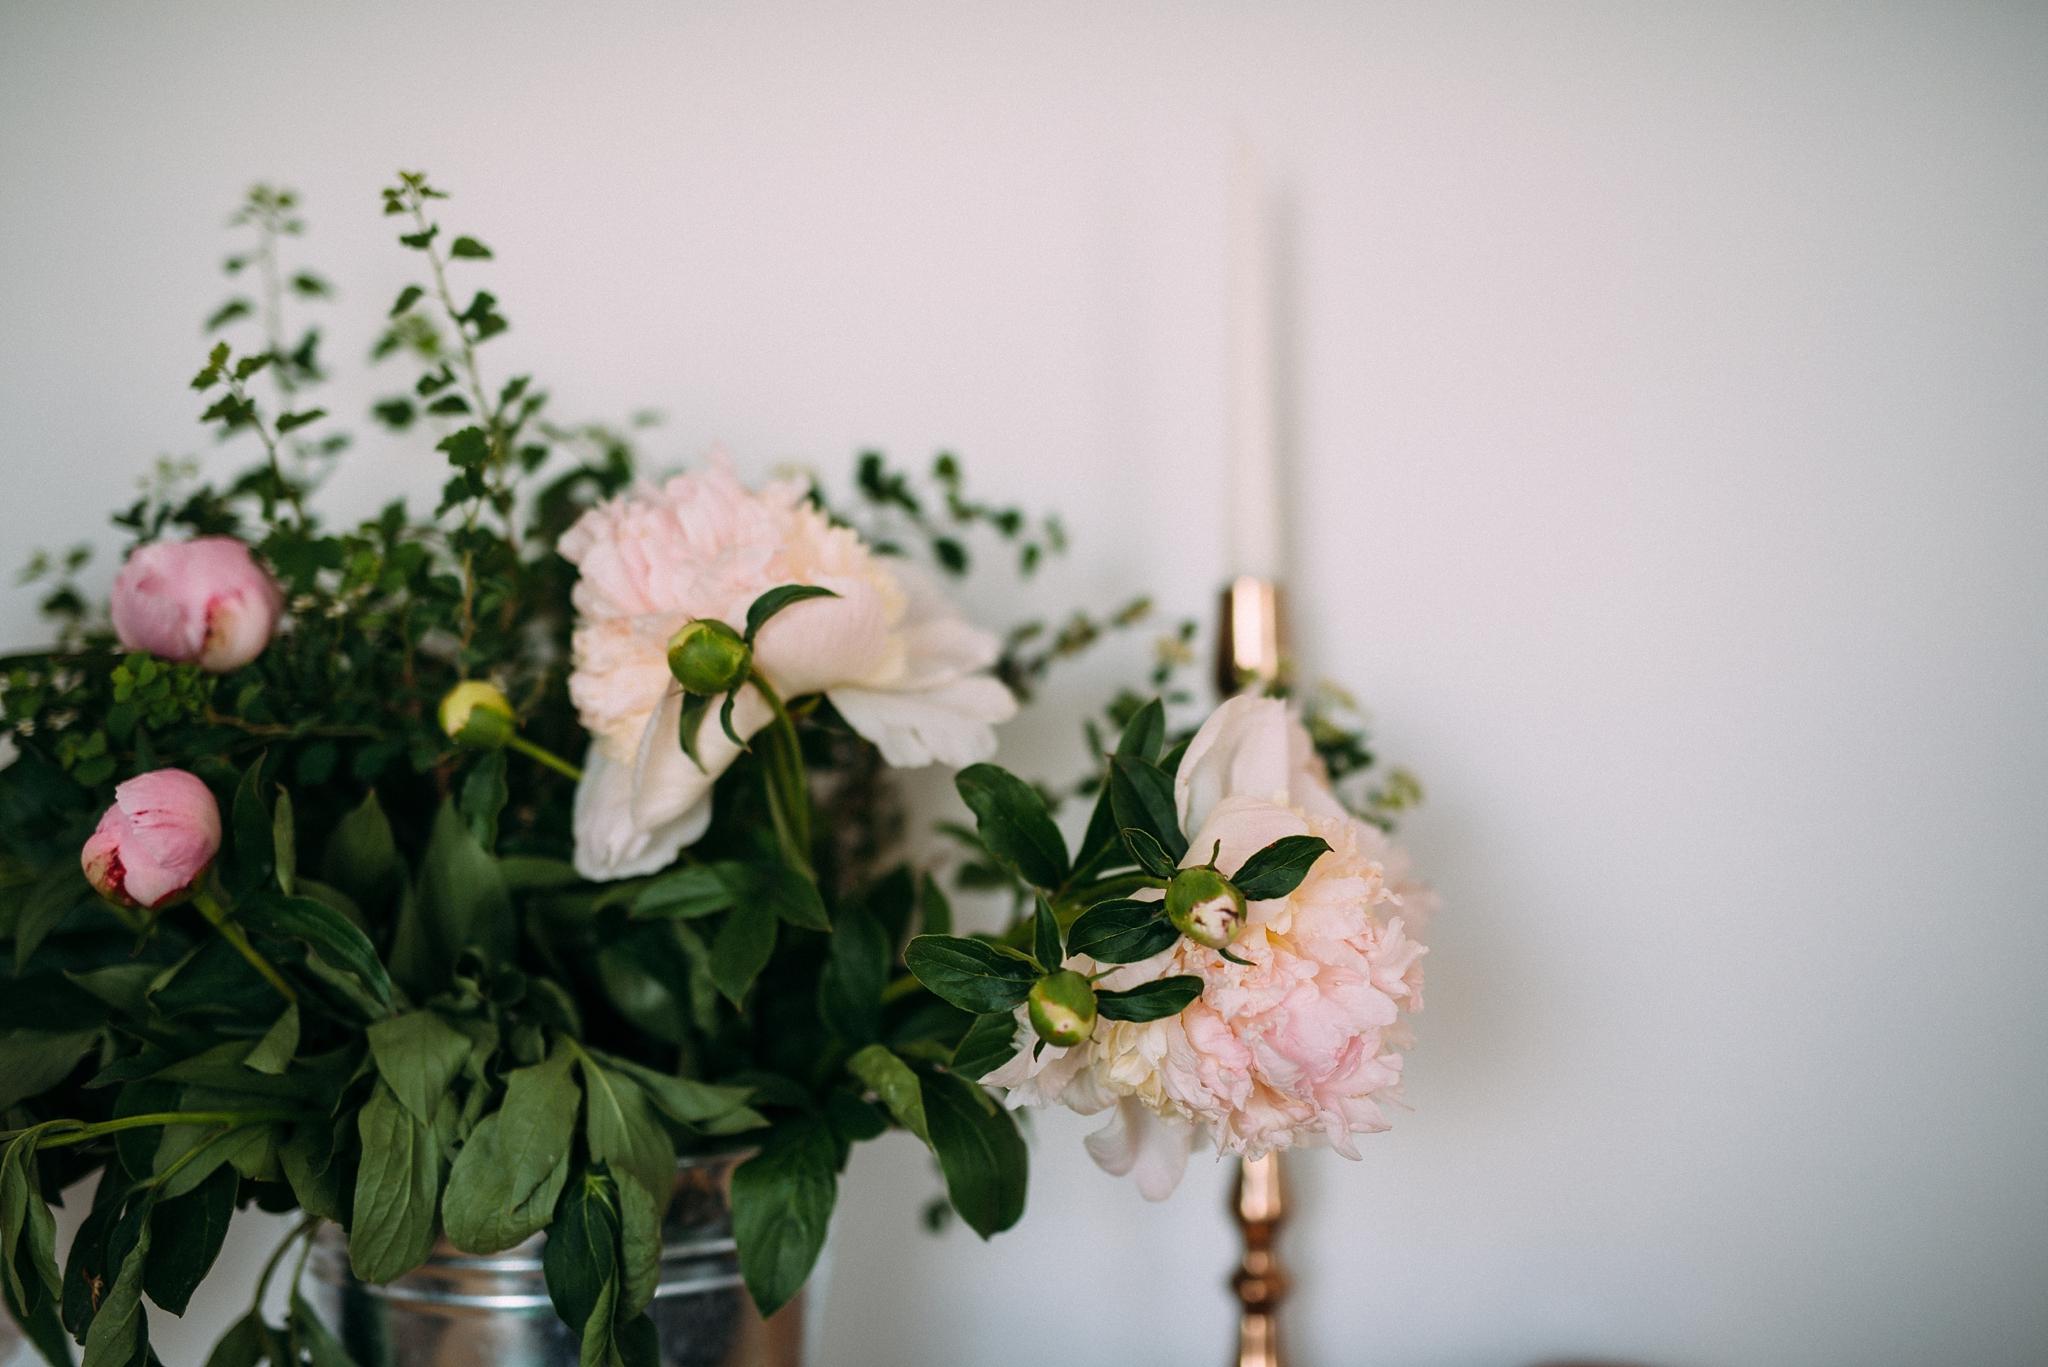 kaihla_tonai_intimate_wedding_elopement_photographer_4016